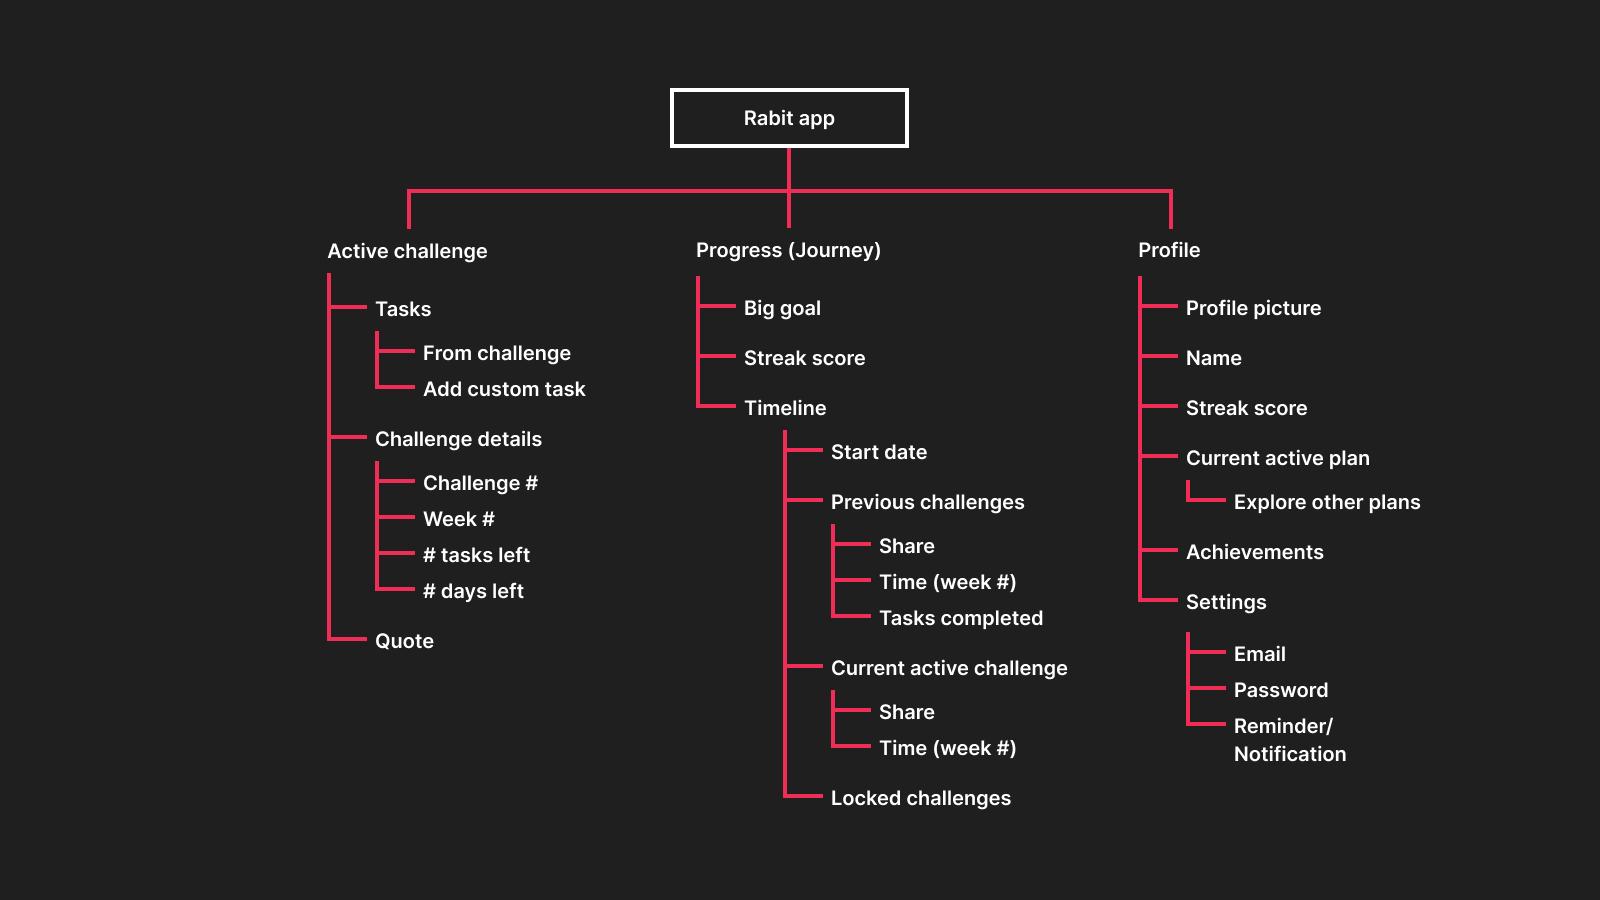 Rabit information architecture.